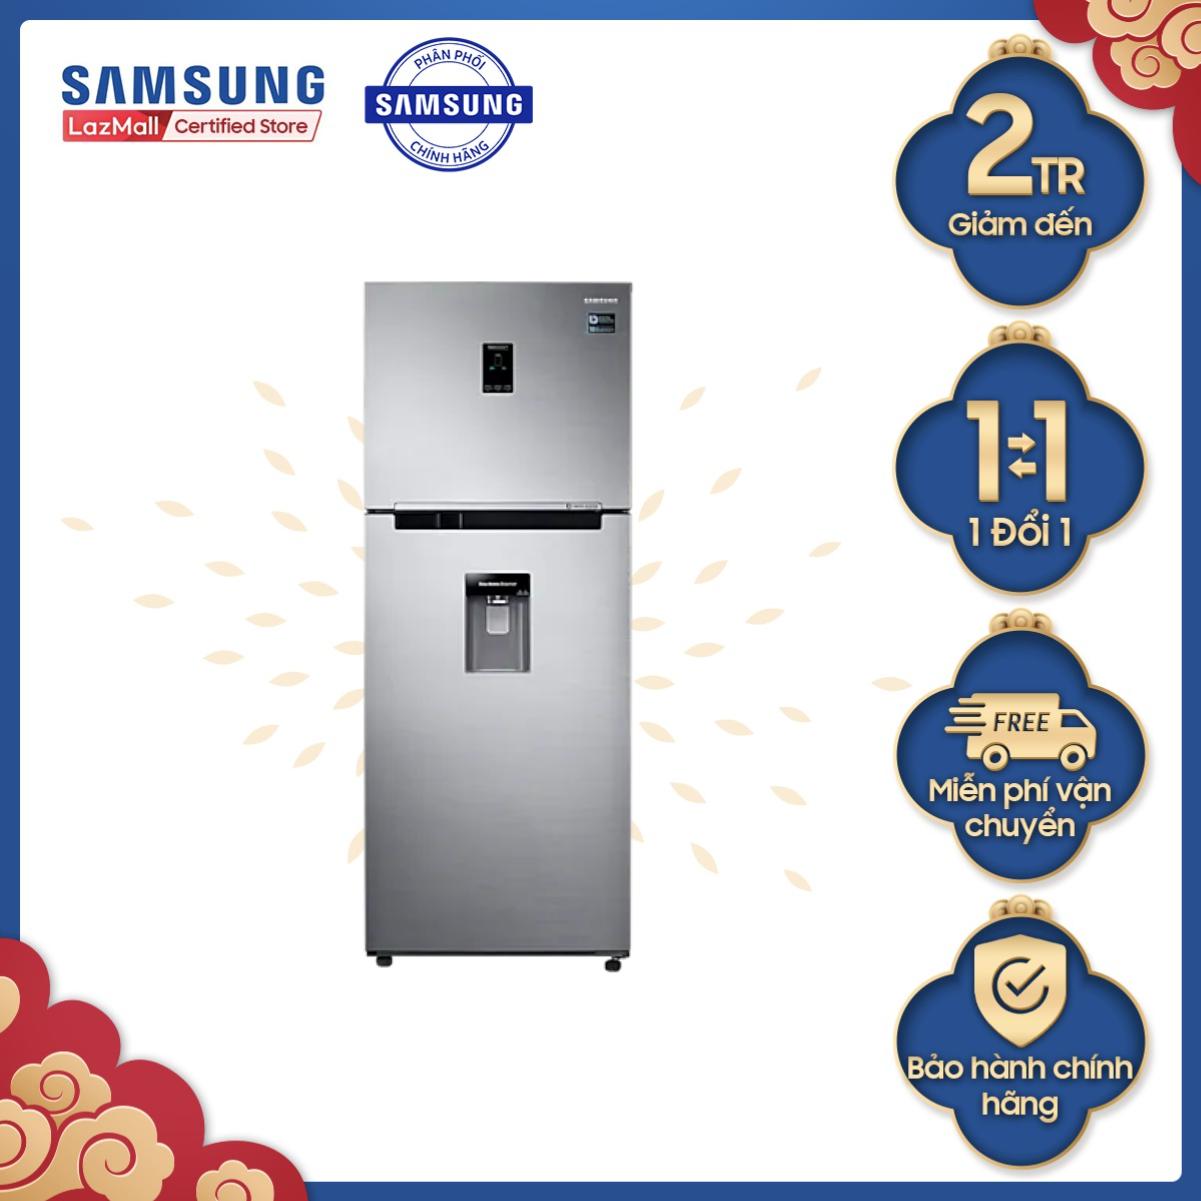 Tủ lạnh Samsung hai cửa Twin Cooling Plus 375L (RT35K5982S8)